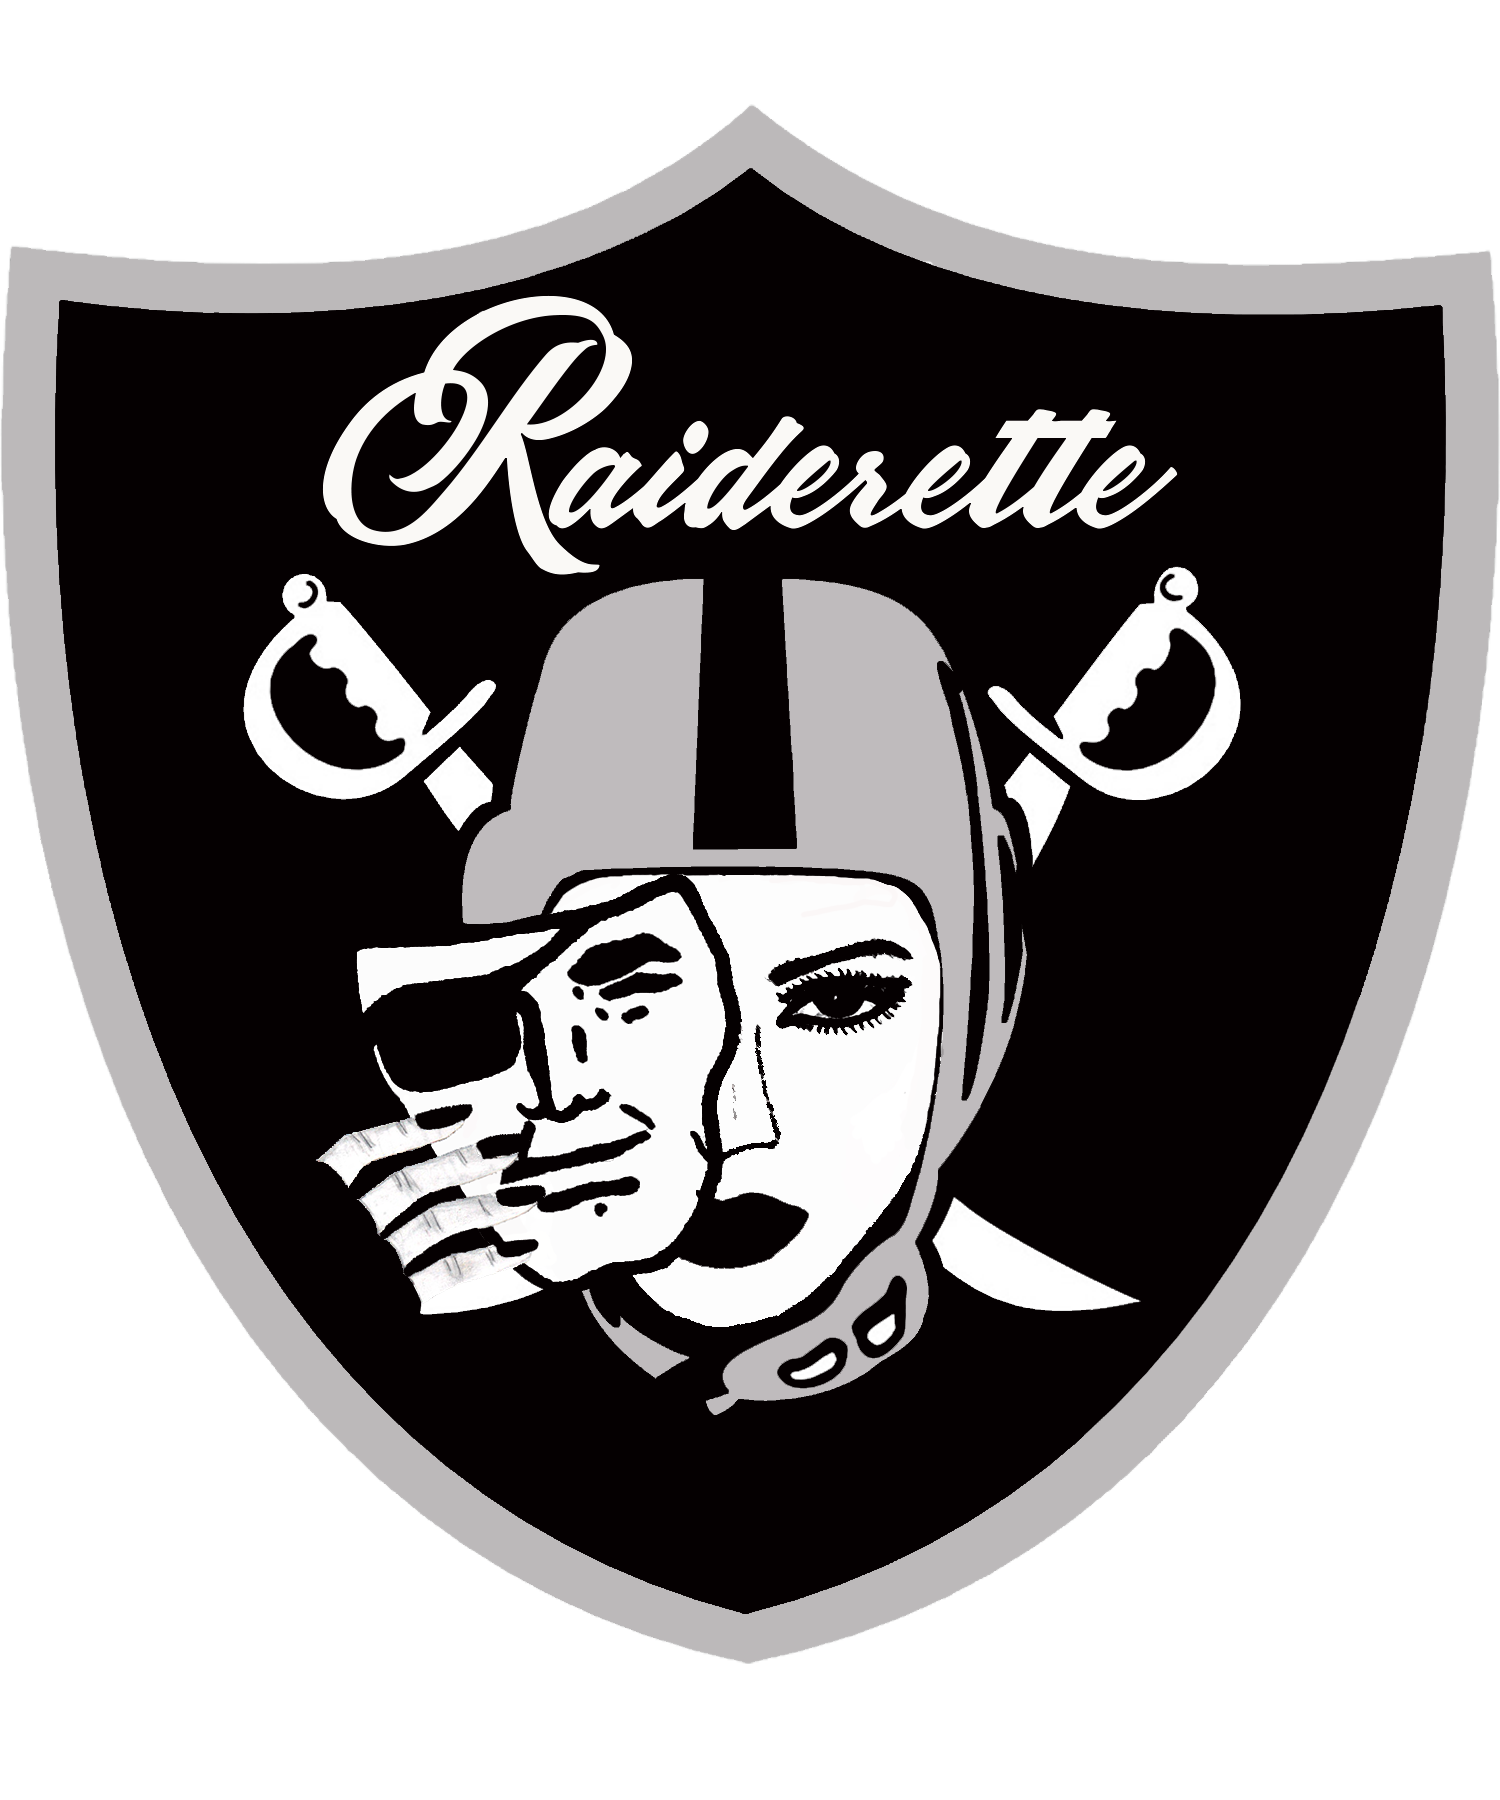 Raiderette Oakland Raiders Logo Raiders Wallpaper Raiders Girl